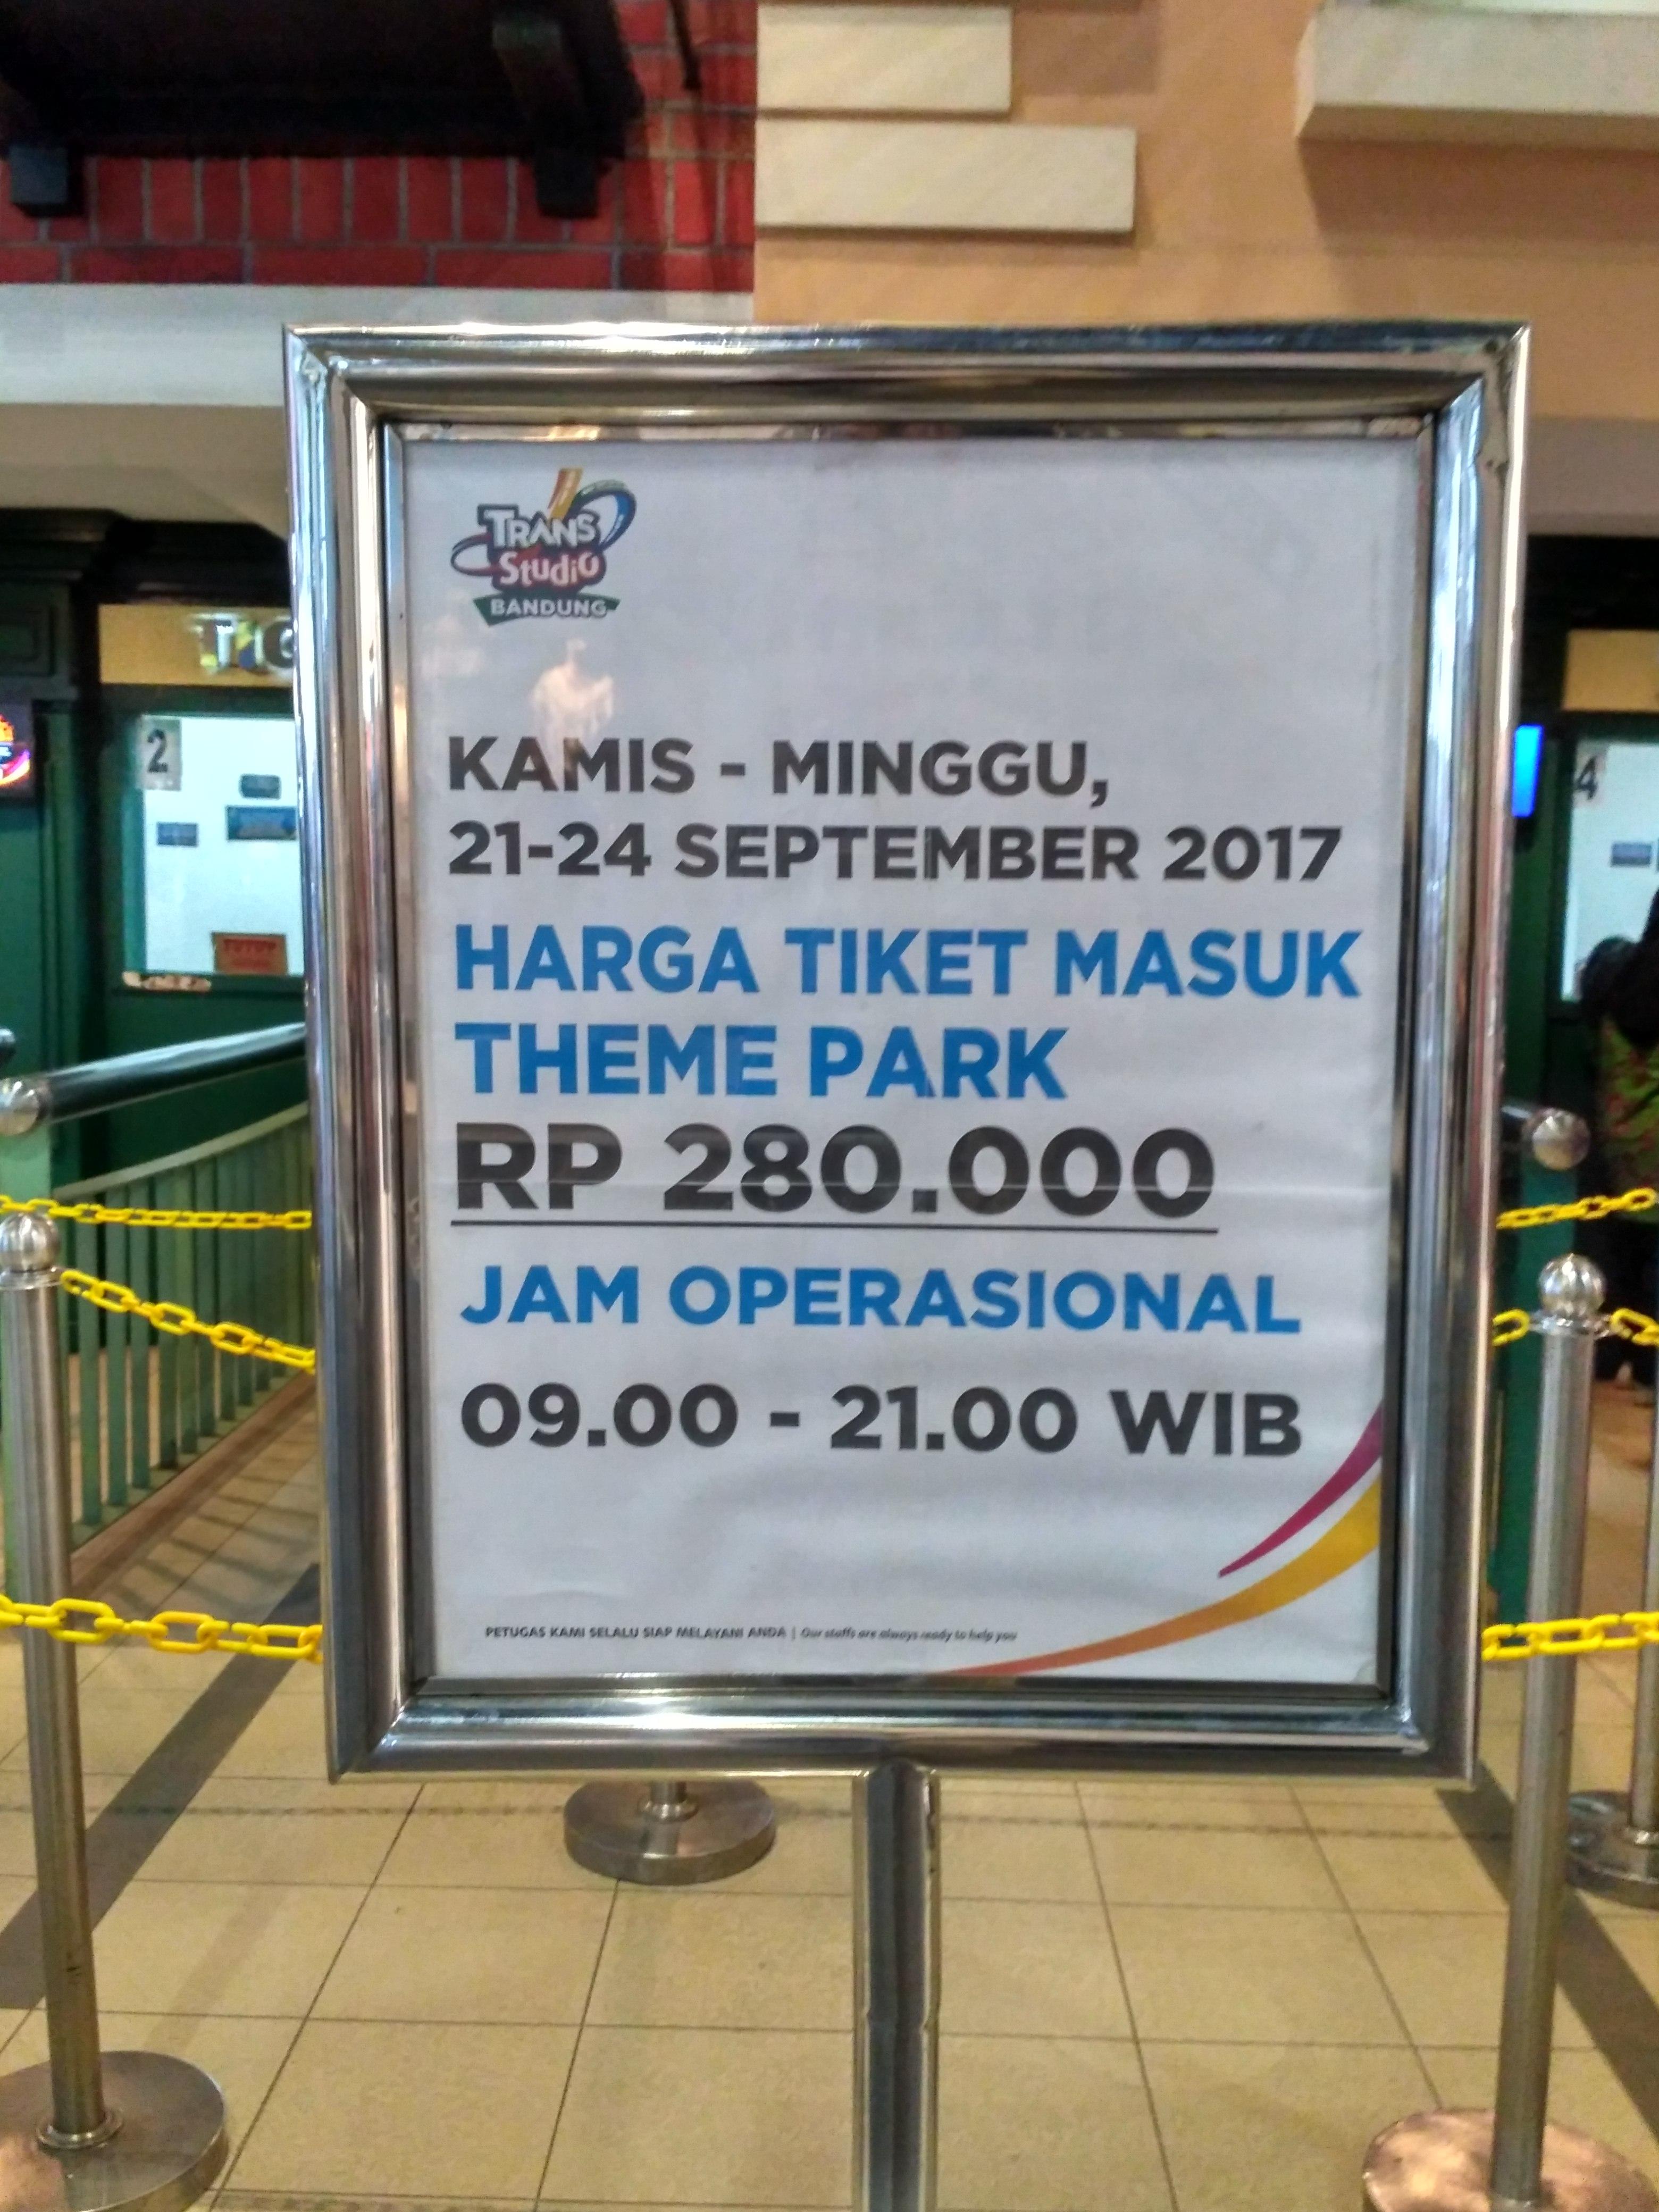 Tcash Dan Promo Terbaru 2018 | Asambackpacker01's Blog